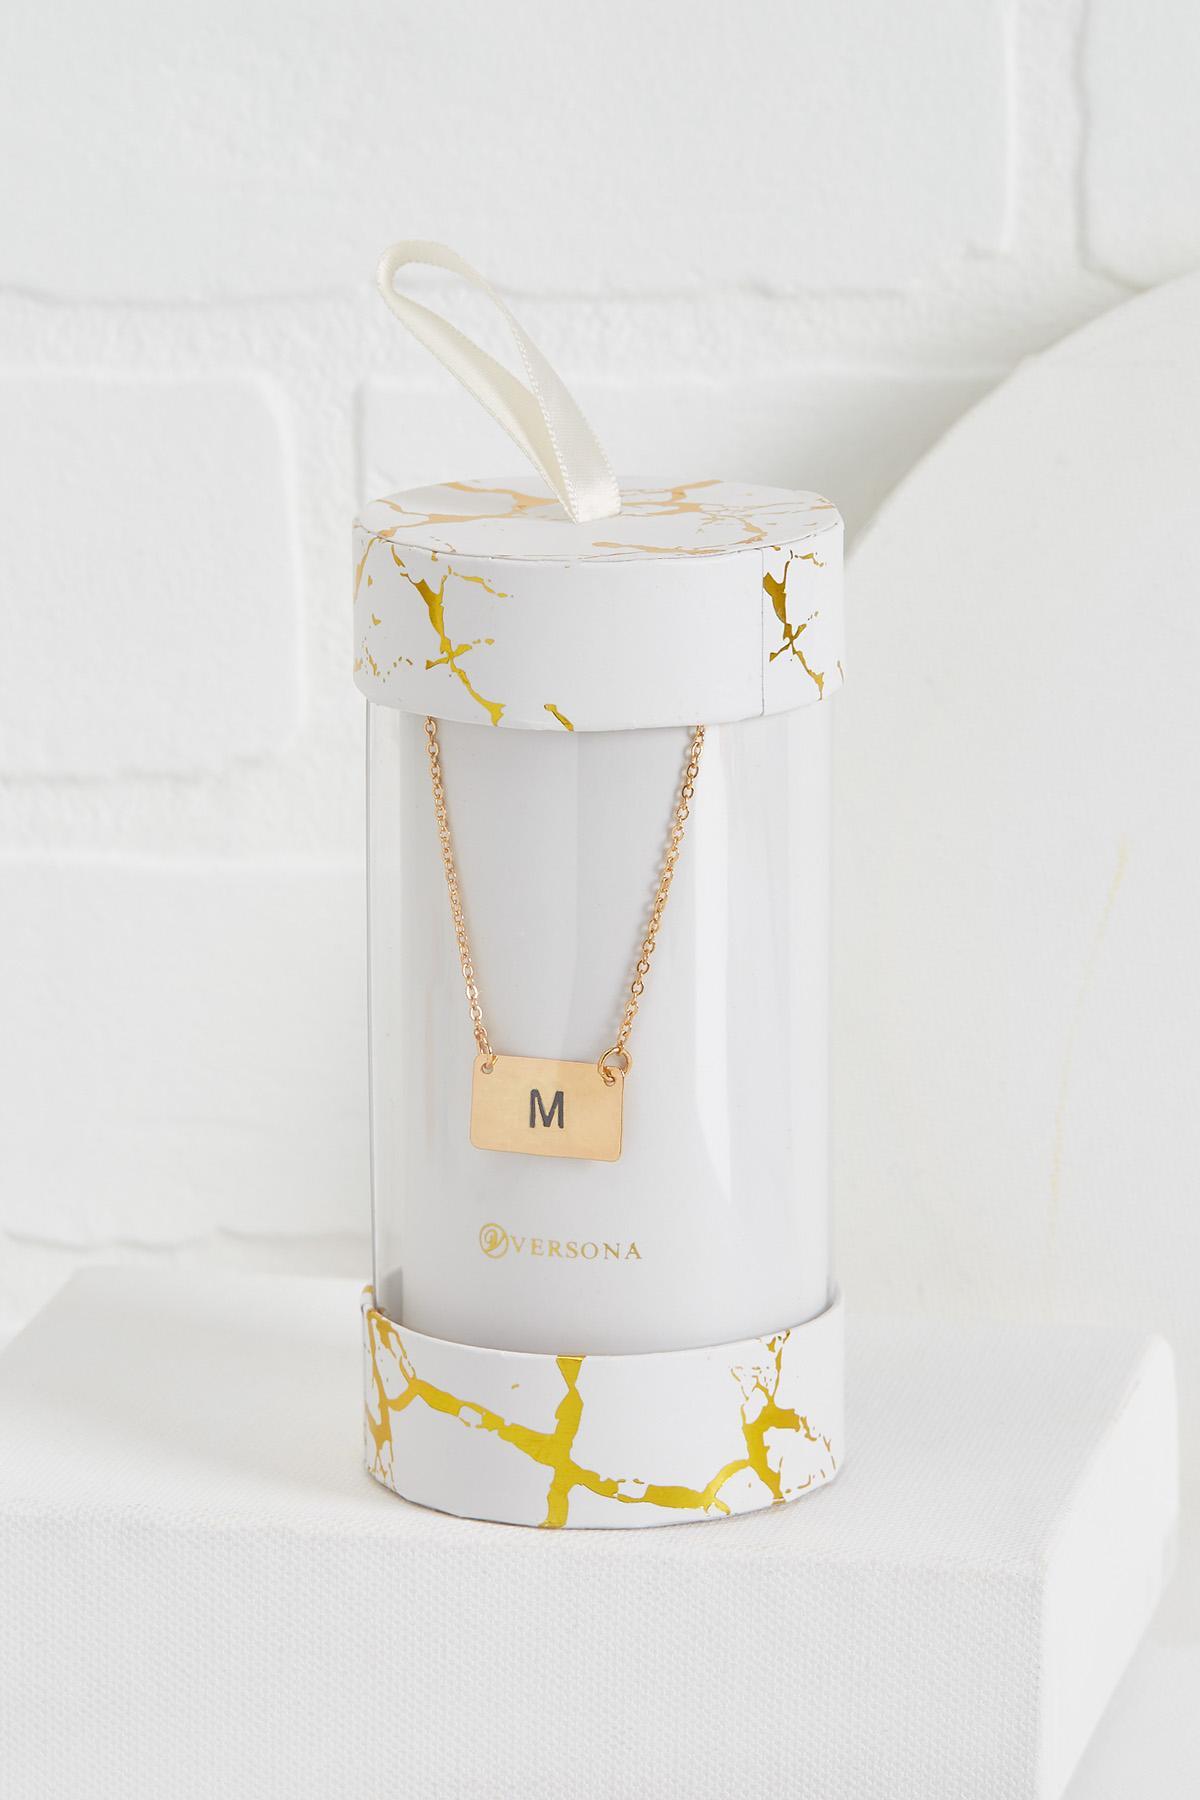 M Initial Pendant Necklace